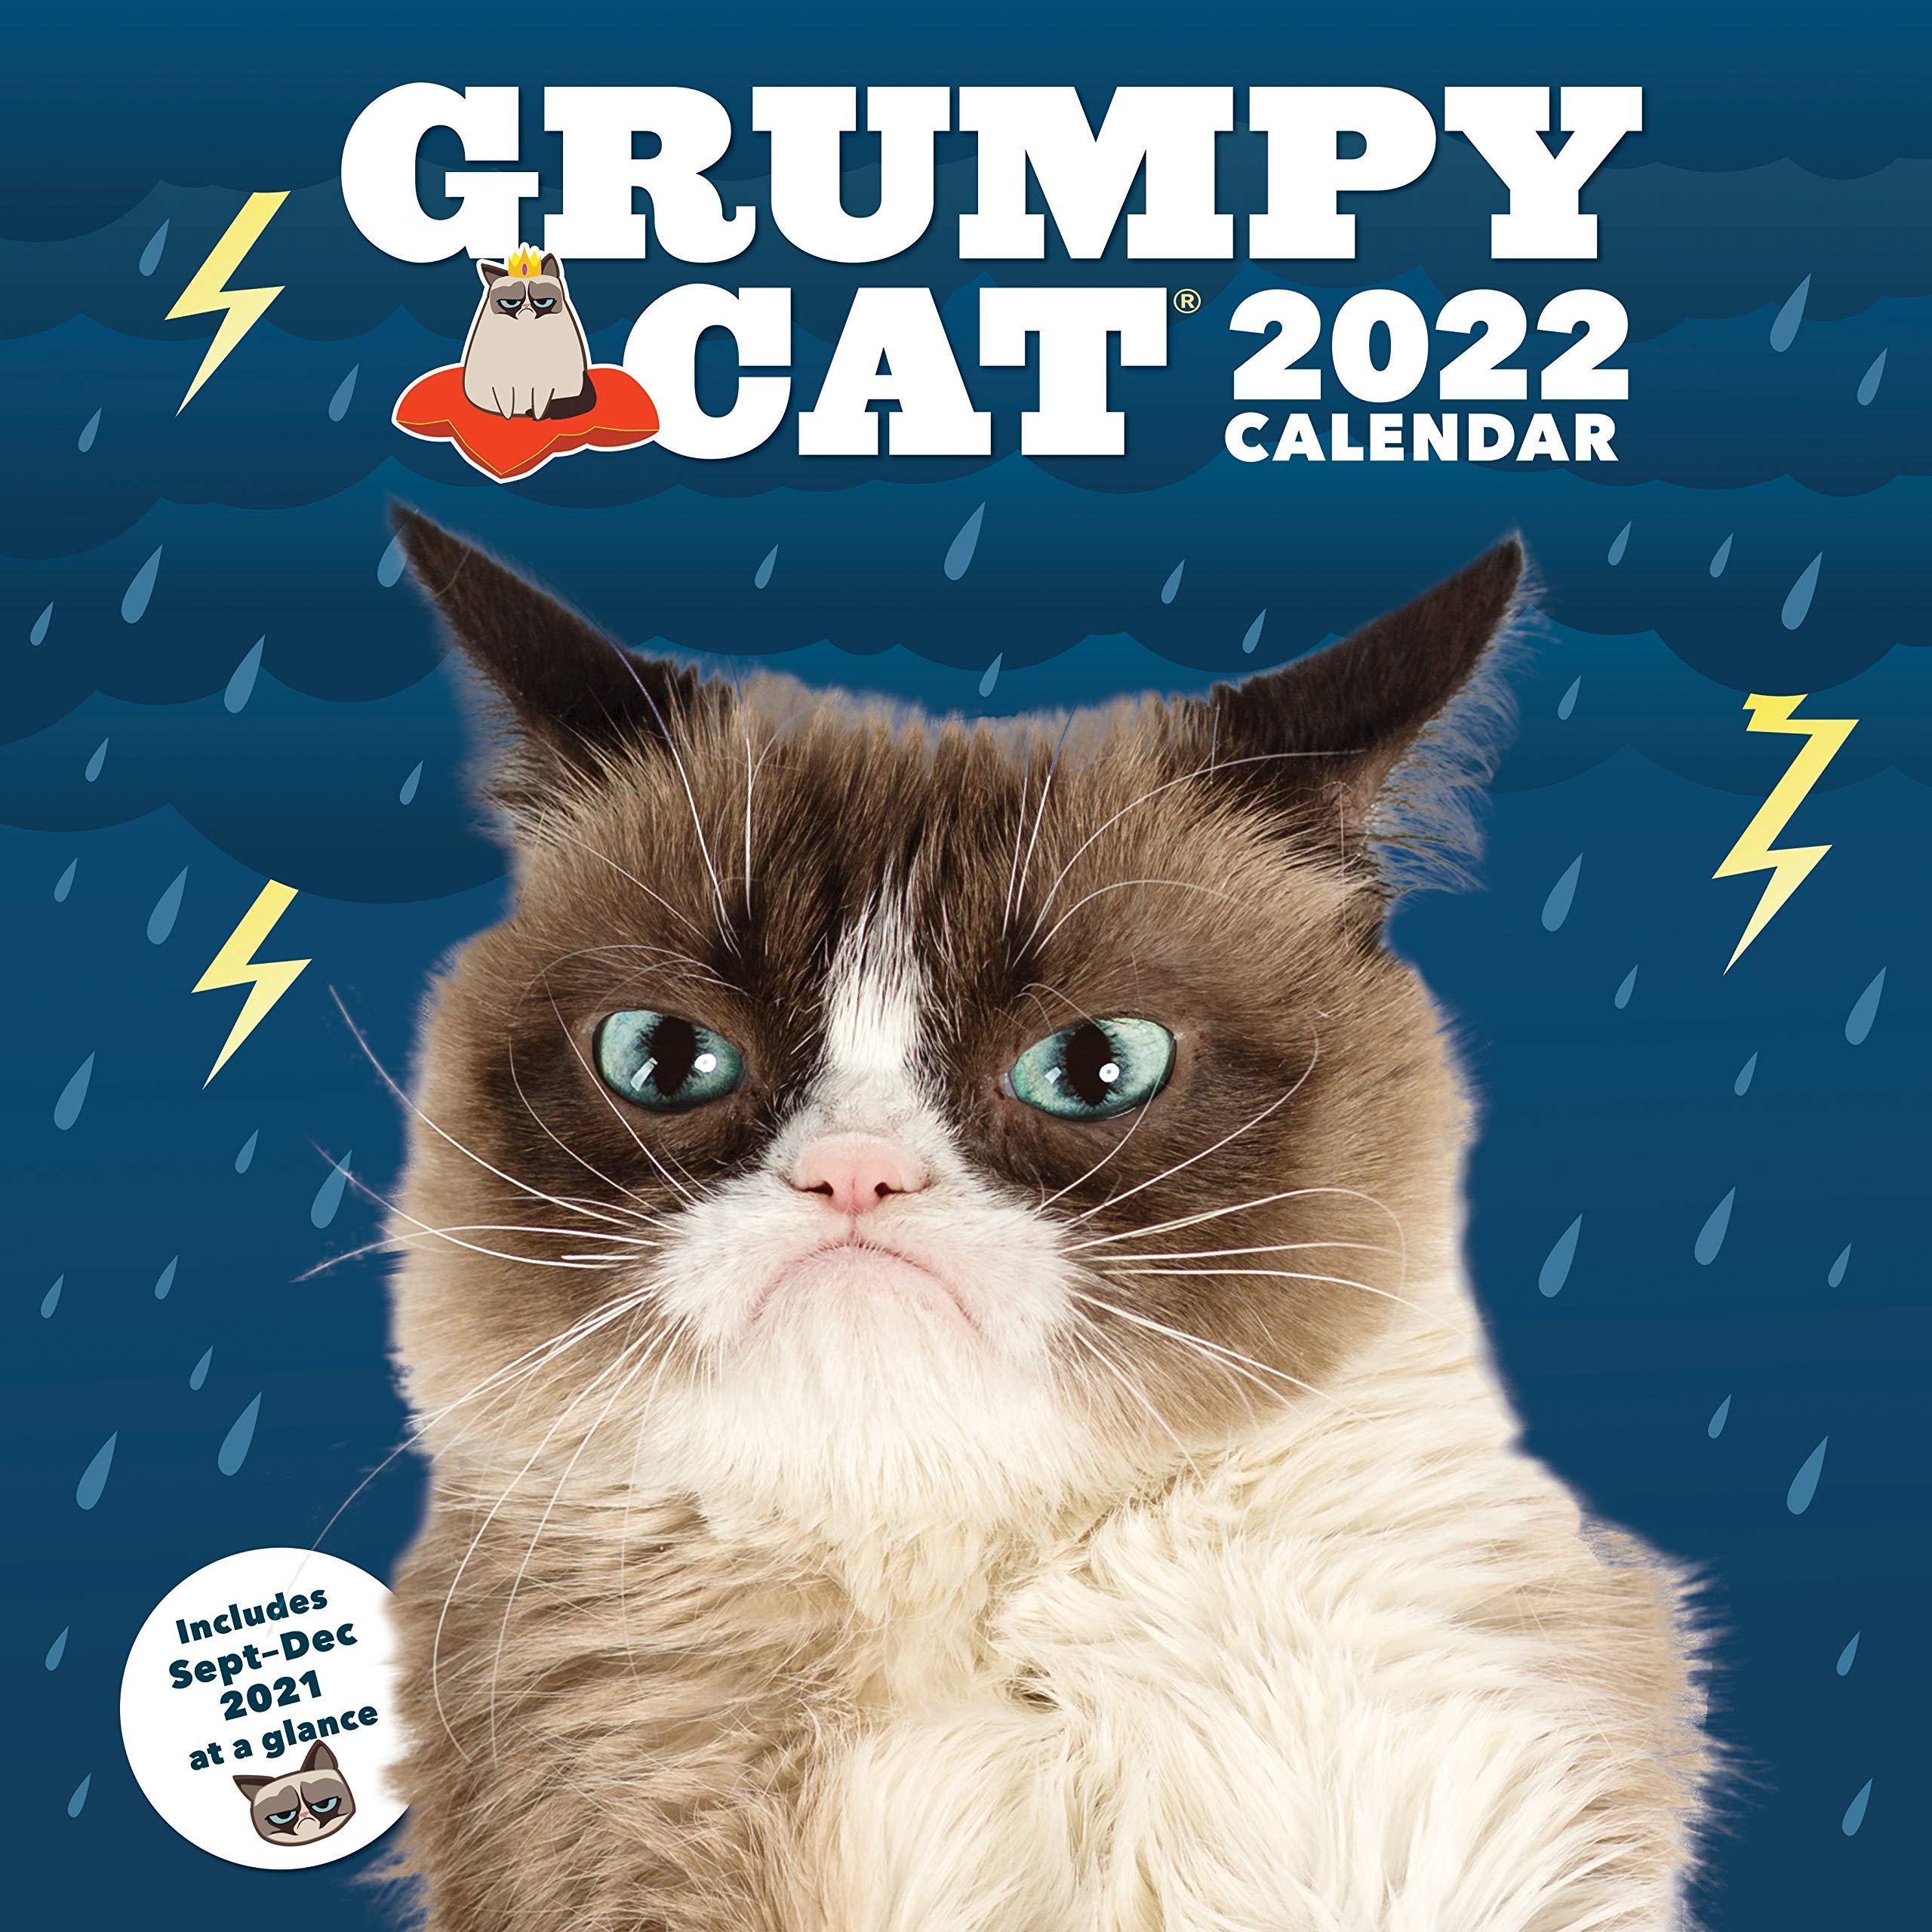 Grumpy Cat Calendar 2022.Amazon In Buy Grumpy Cat 2022 Wall Calendar Book Online At Low Prices In India Grumpy Cat 2022 Wall Calendar Reviews Ratings